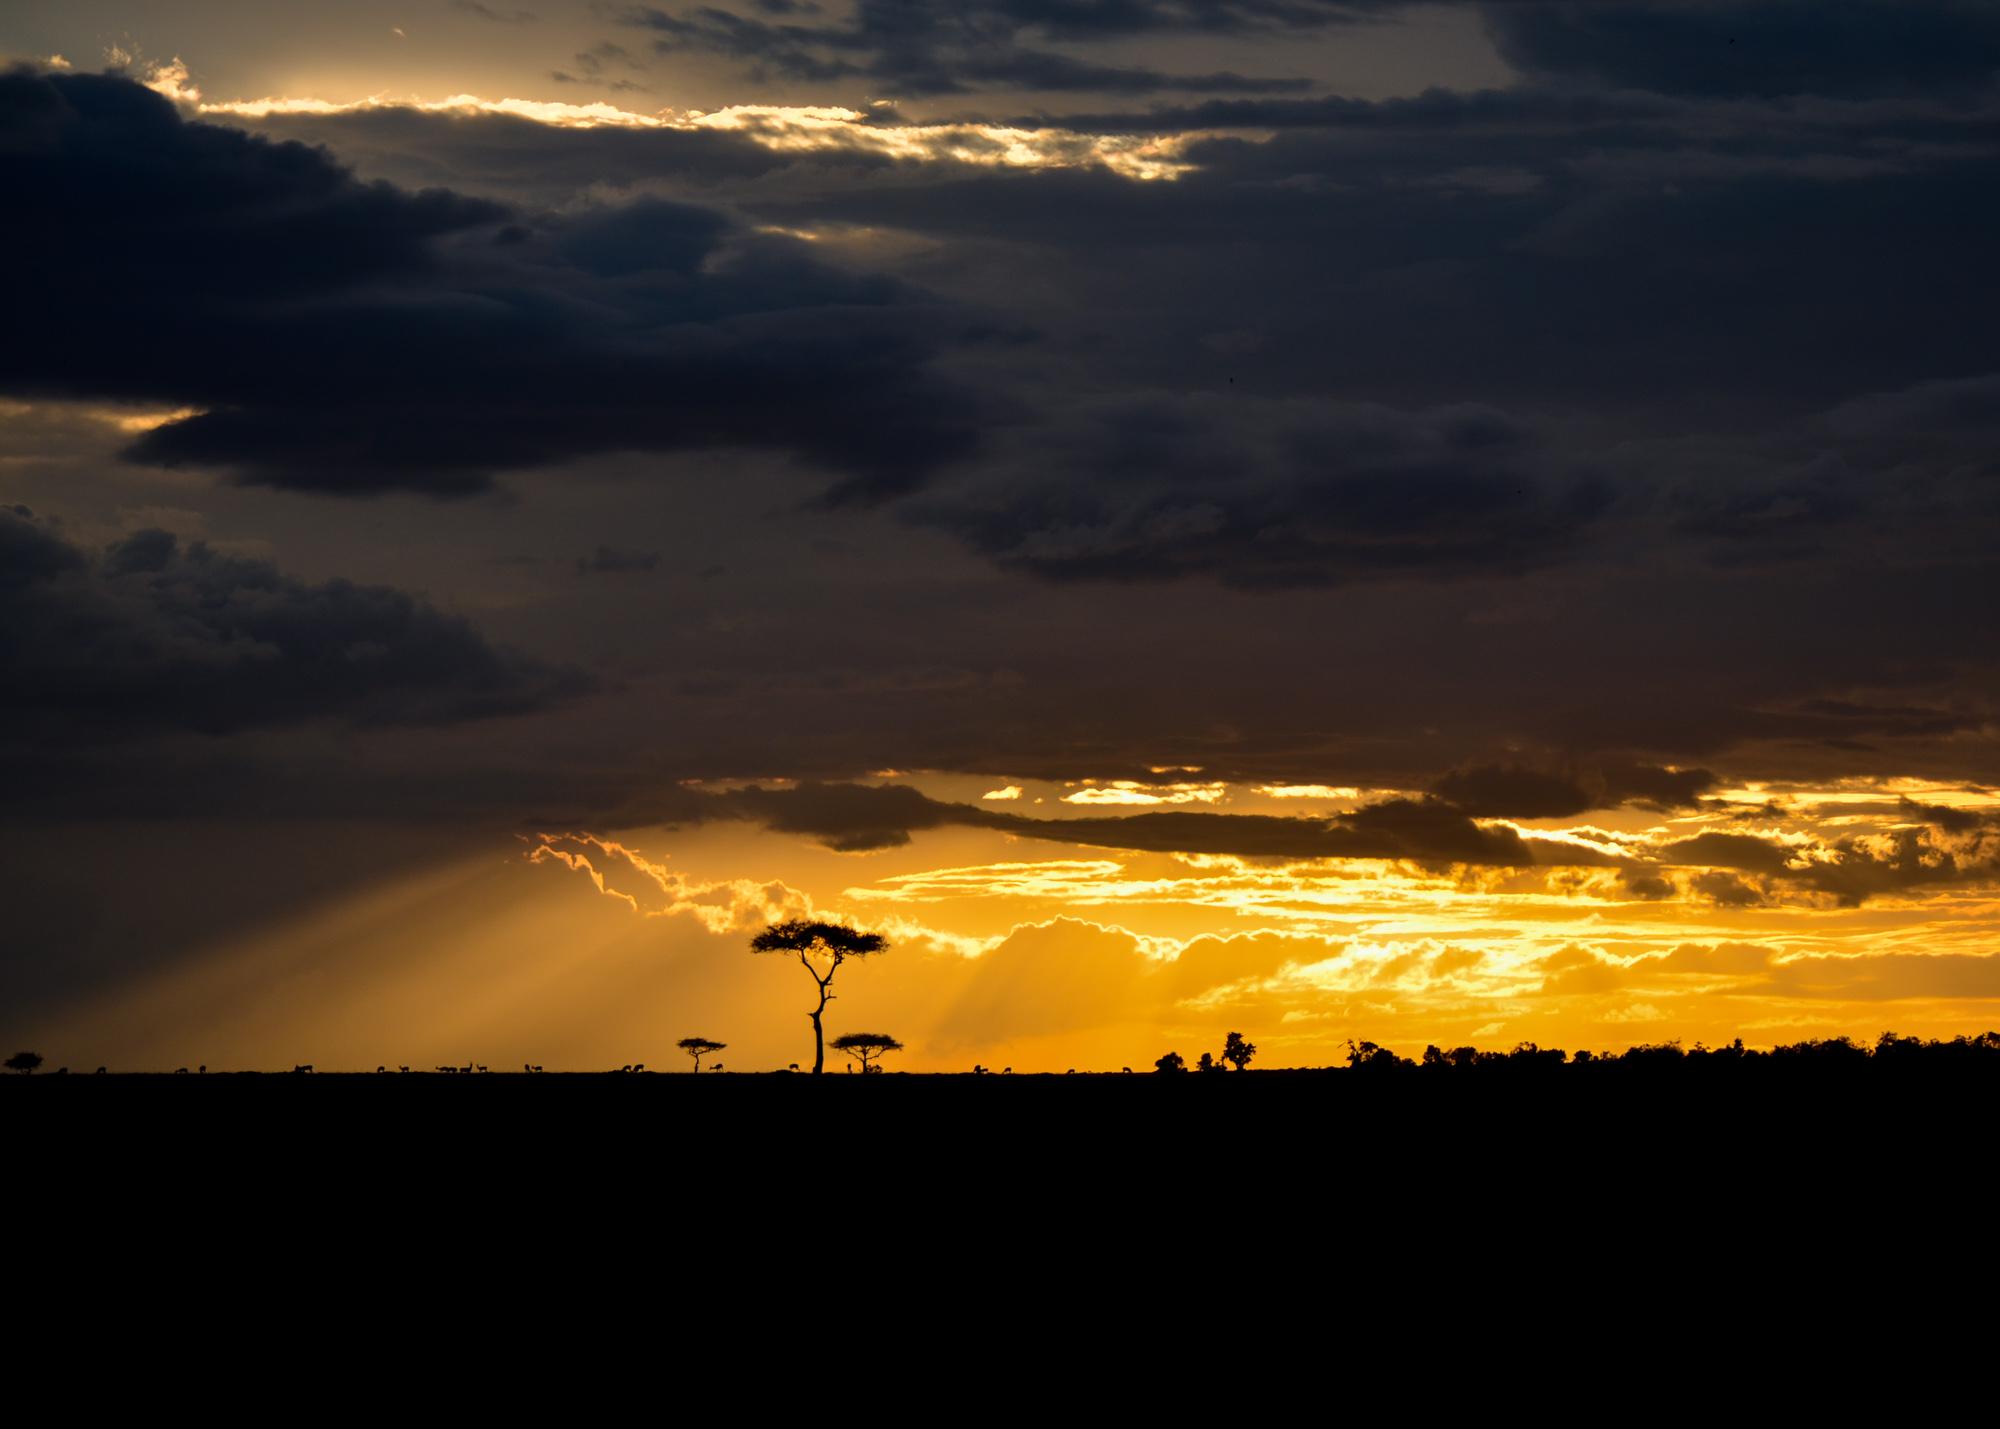 rift-valley-kenya-sunset1-5x7-card-2011-10-25.jpg